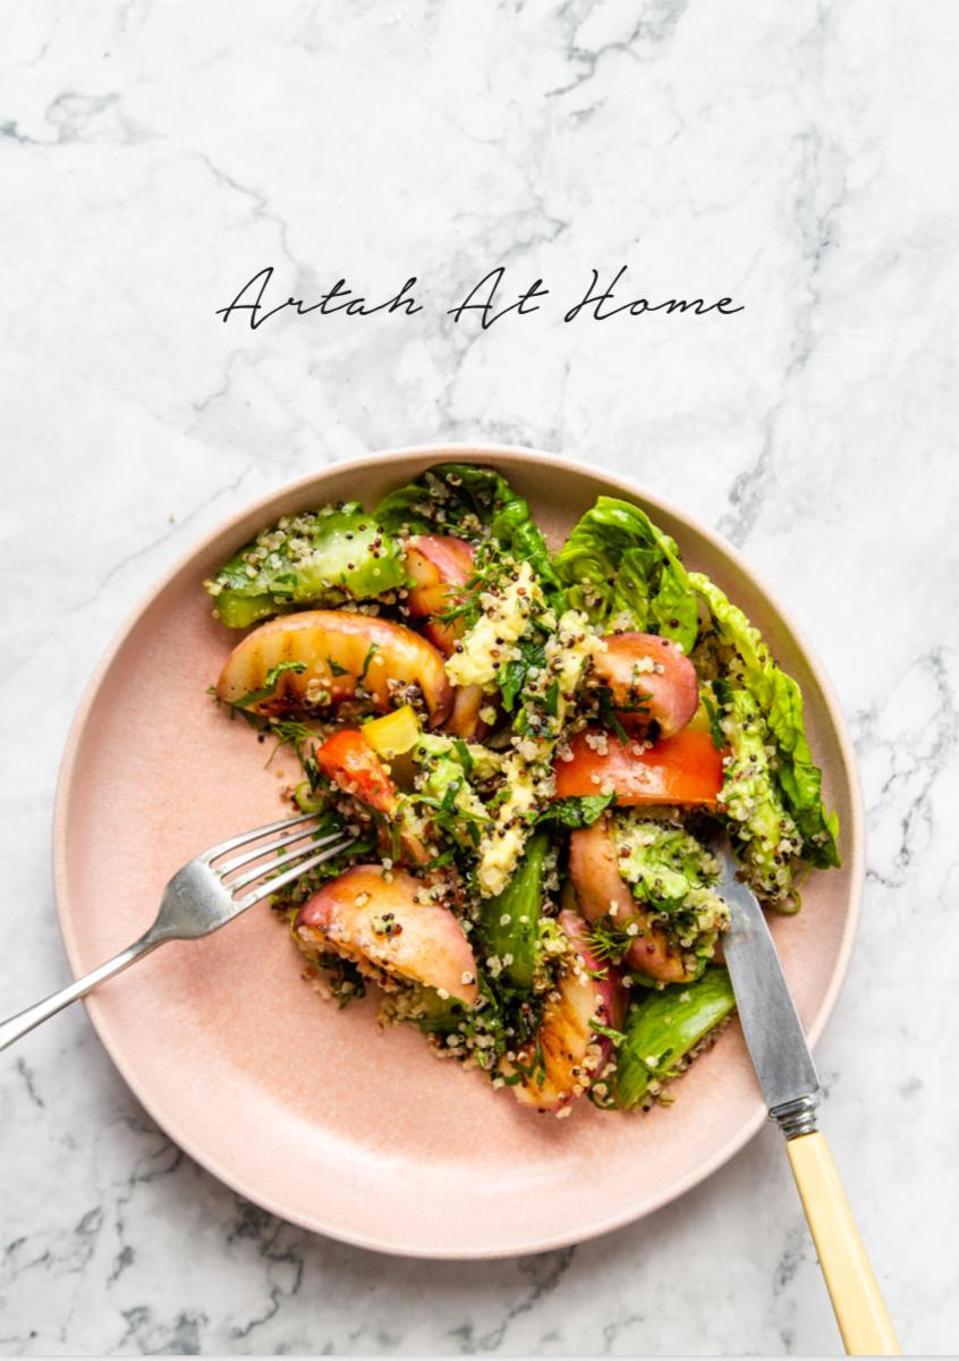 Artah at home programme